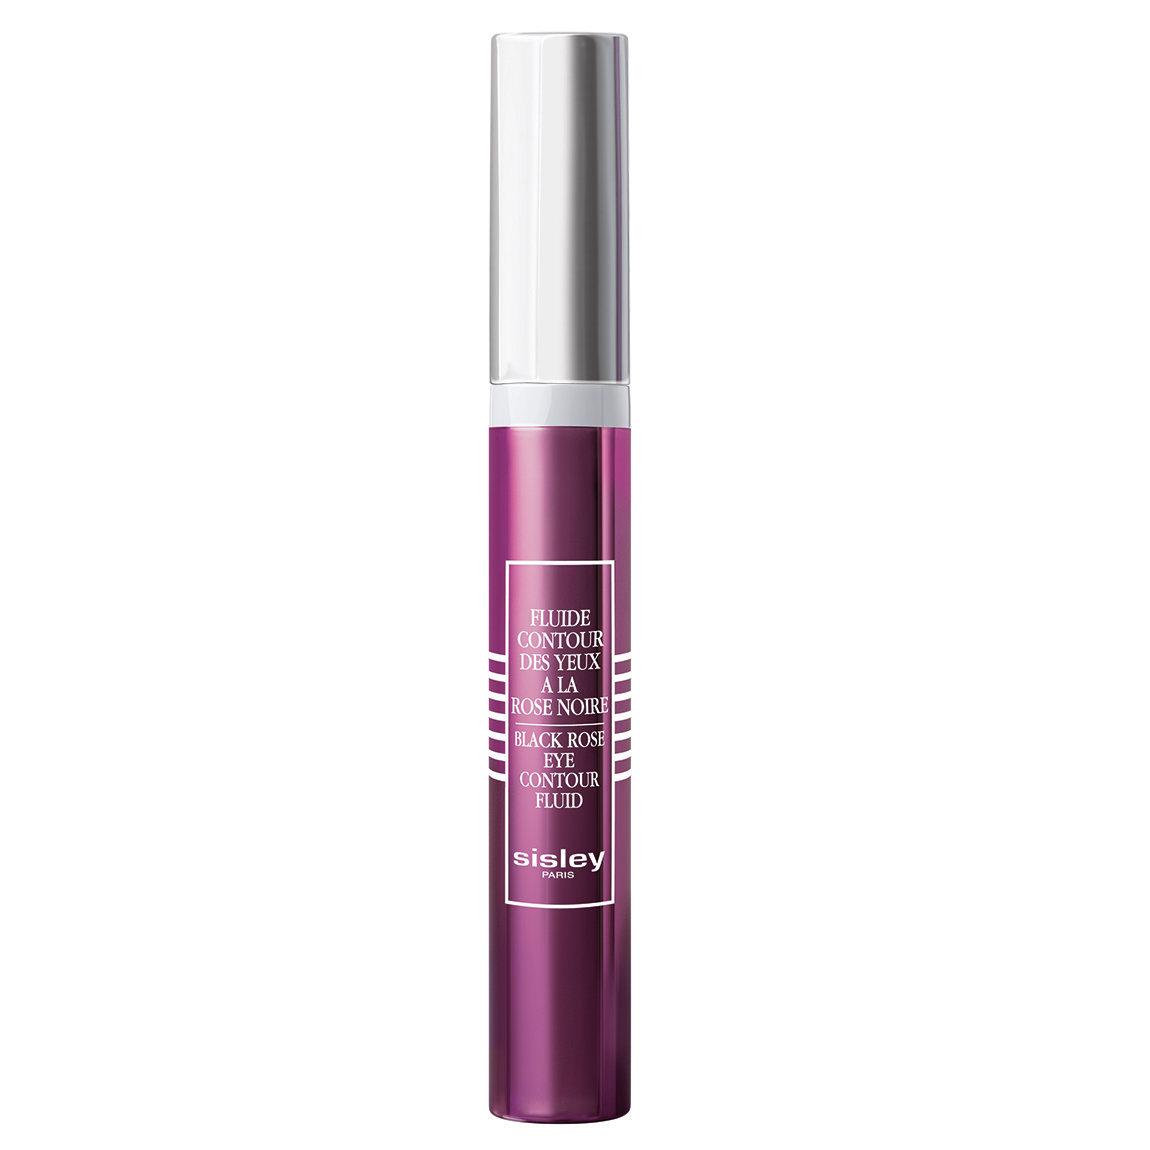 Sisley-Paris Black Rose Eye Contour Fluid product swatch.